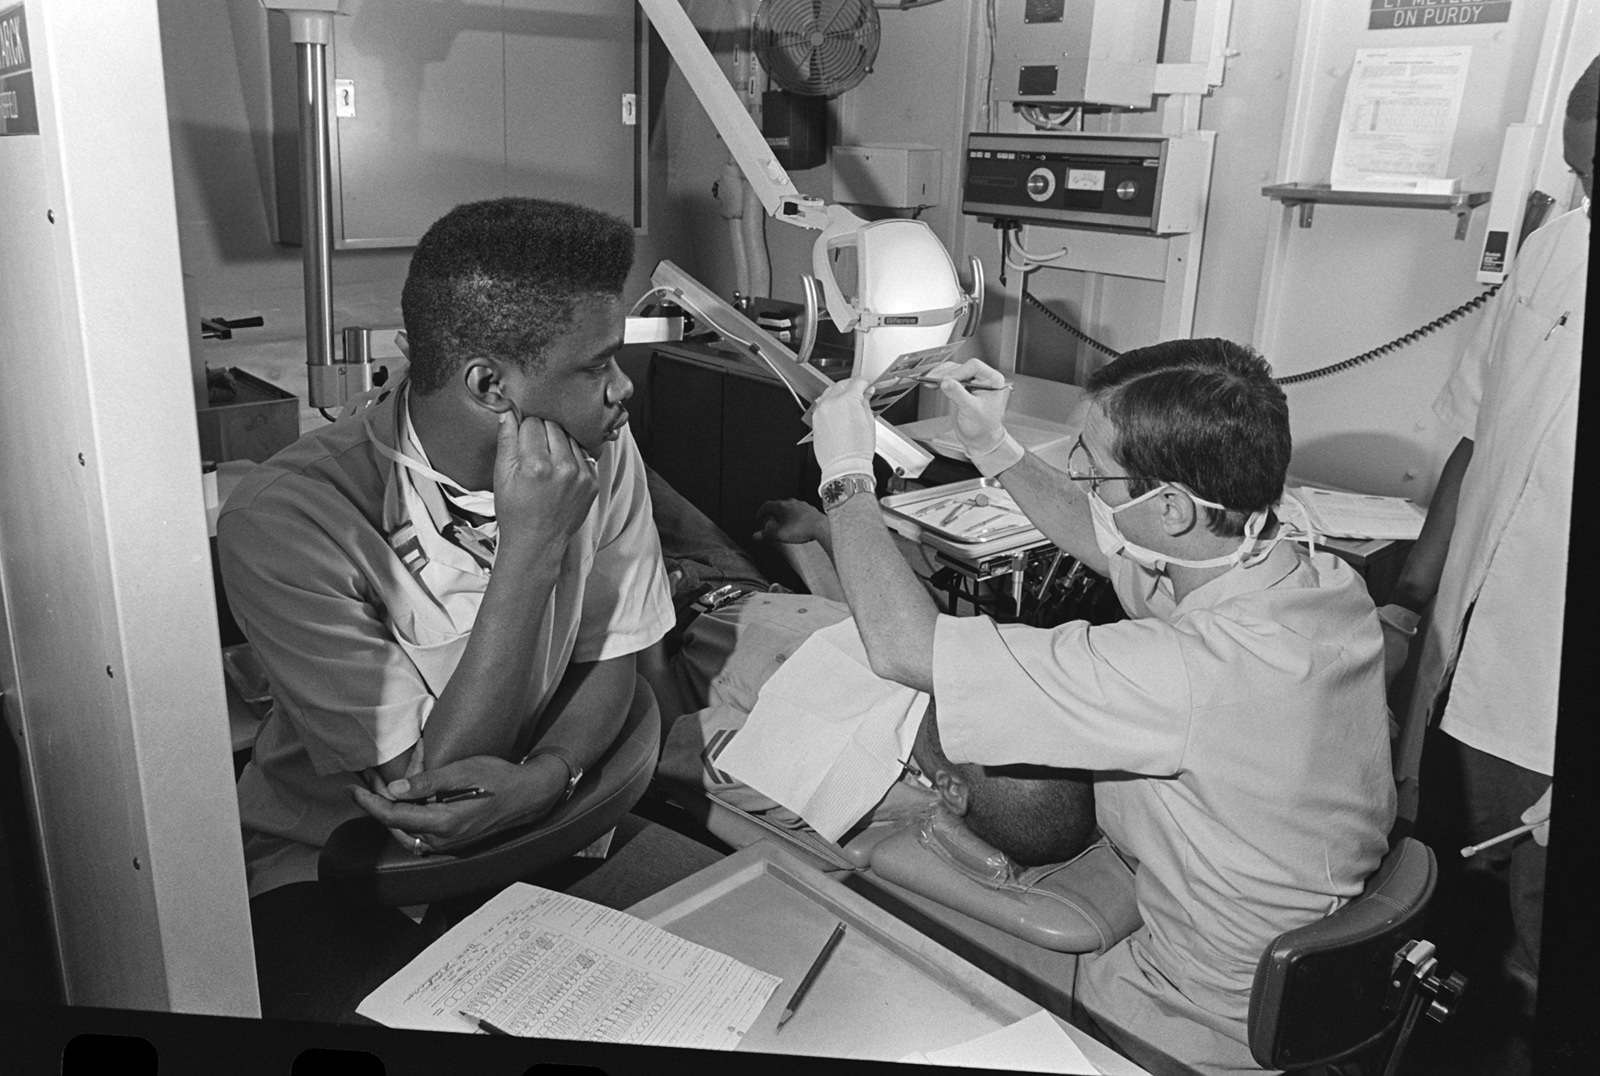 Dentalman (DN) Eric Purdy, left, records information as the dentist, Lieutenant (LT) (Dr.) David Metzler, explains an X-ray to his patient on board the battleship USS MISSOURI (BB 63)